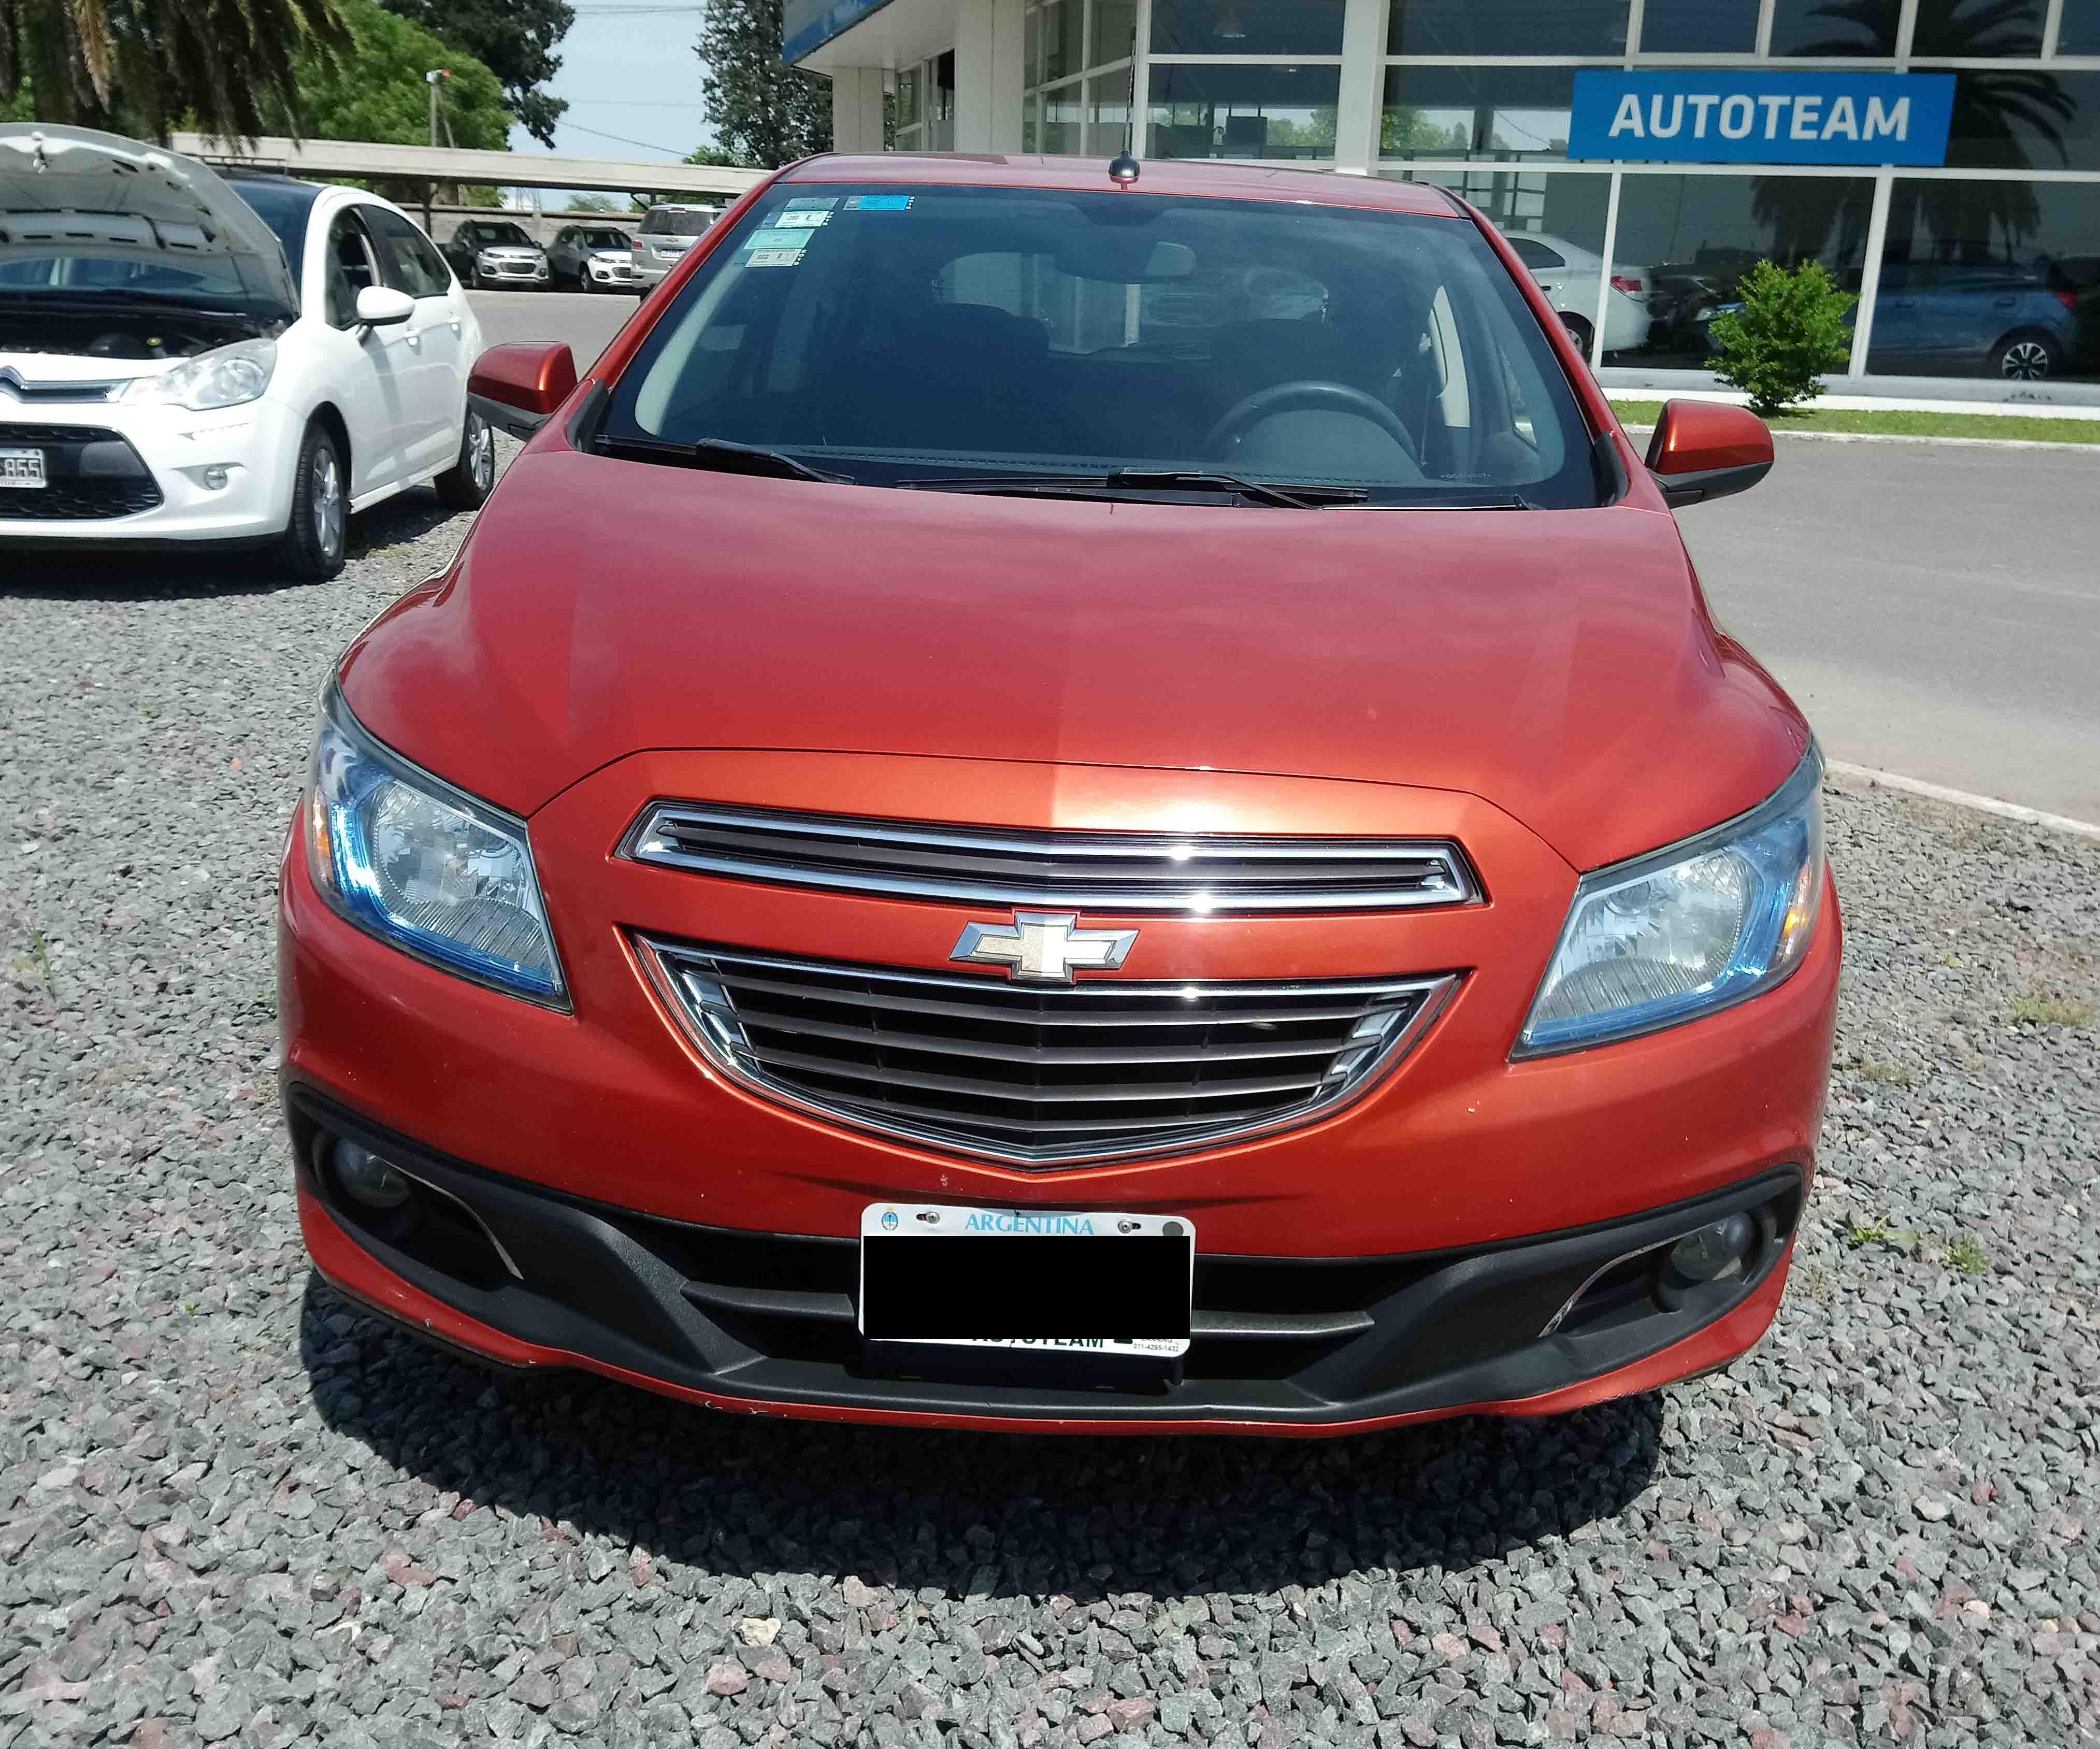 2013 Chevrolet Onix LTZ 1.4L